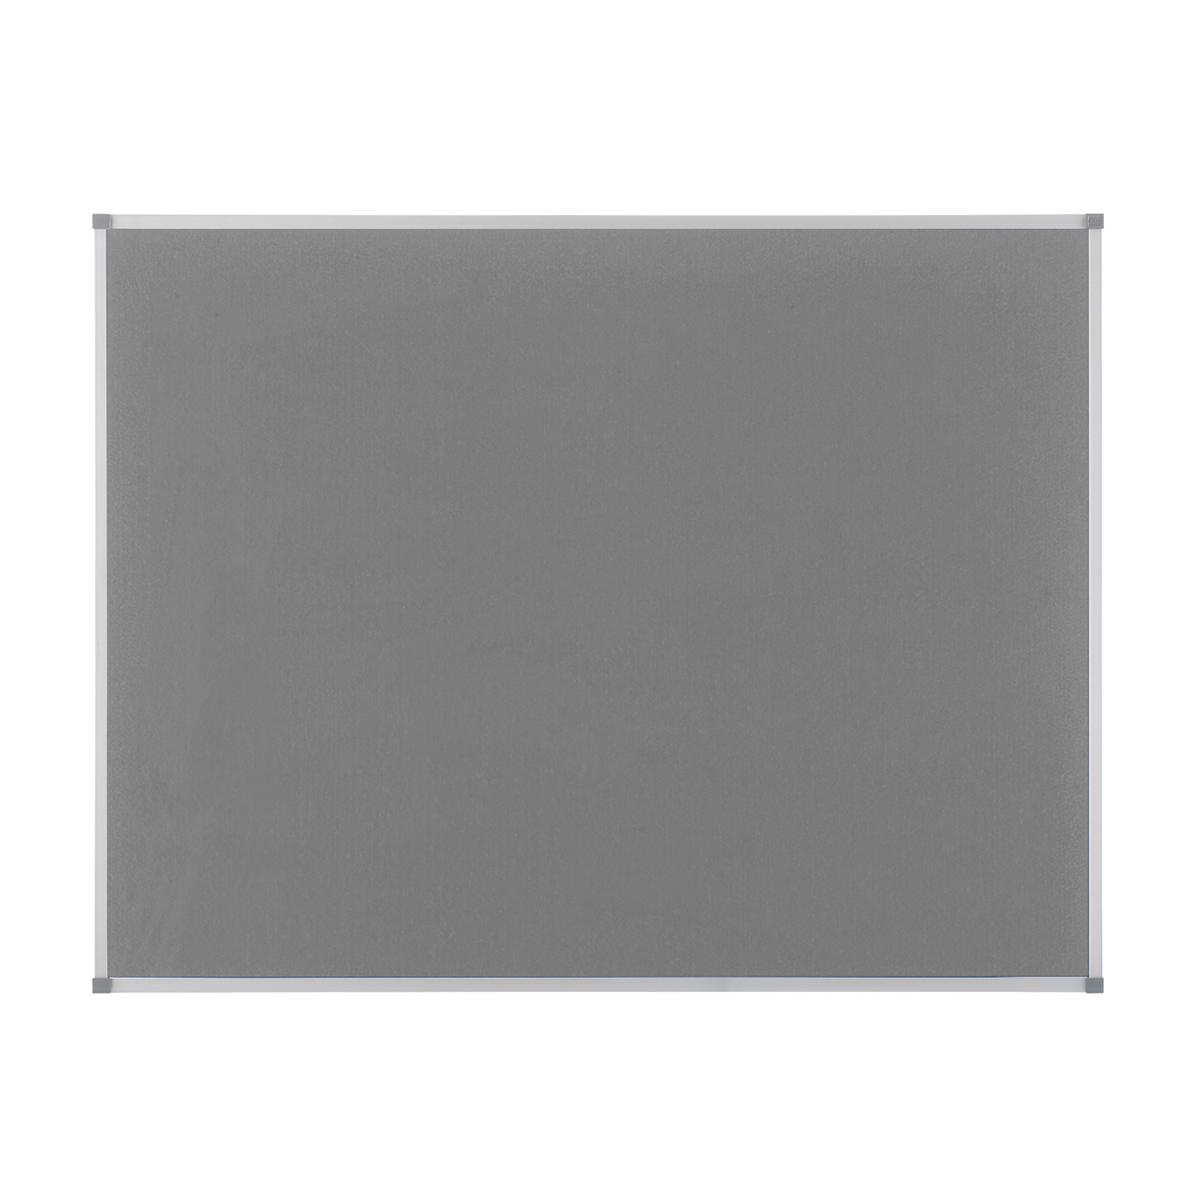 Nobo 1900912 Classic Grey Felt Noticeboard 1200 x 900mm